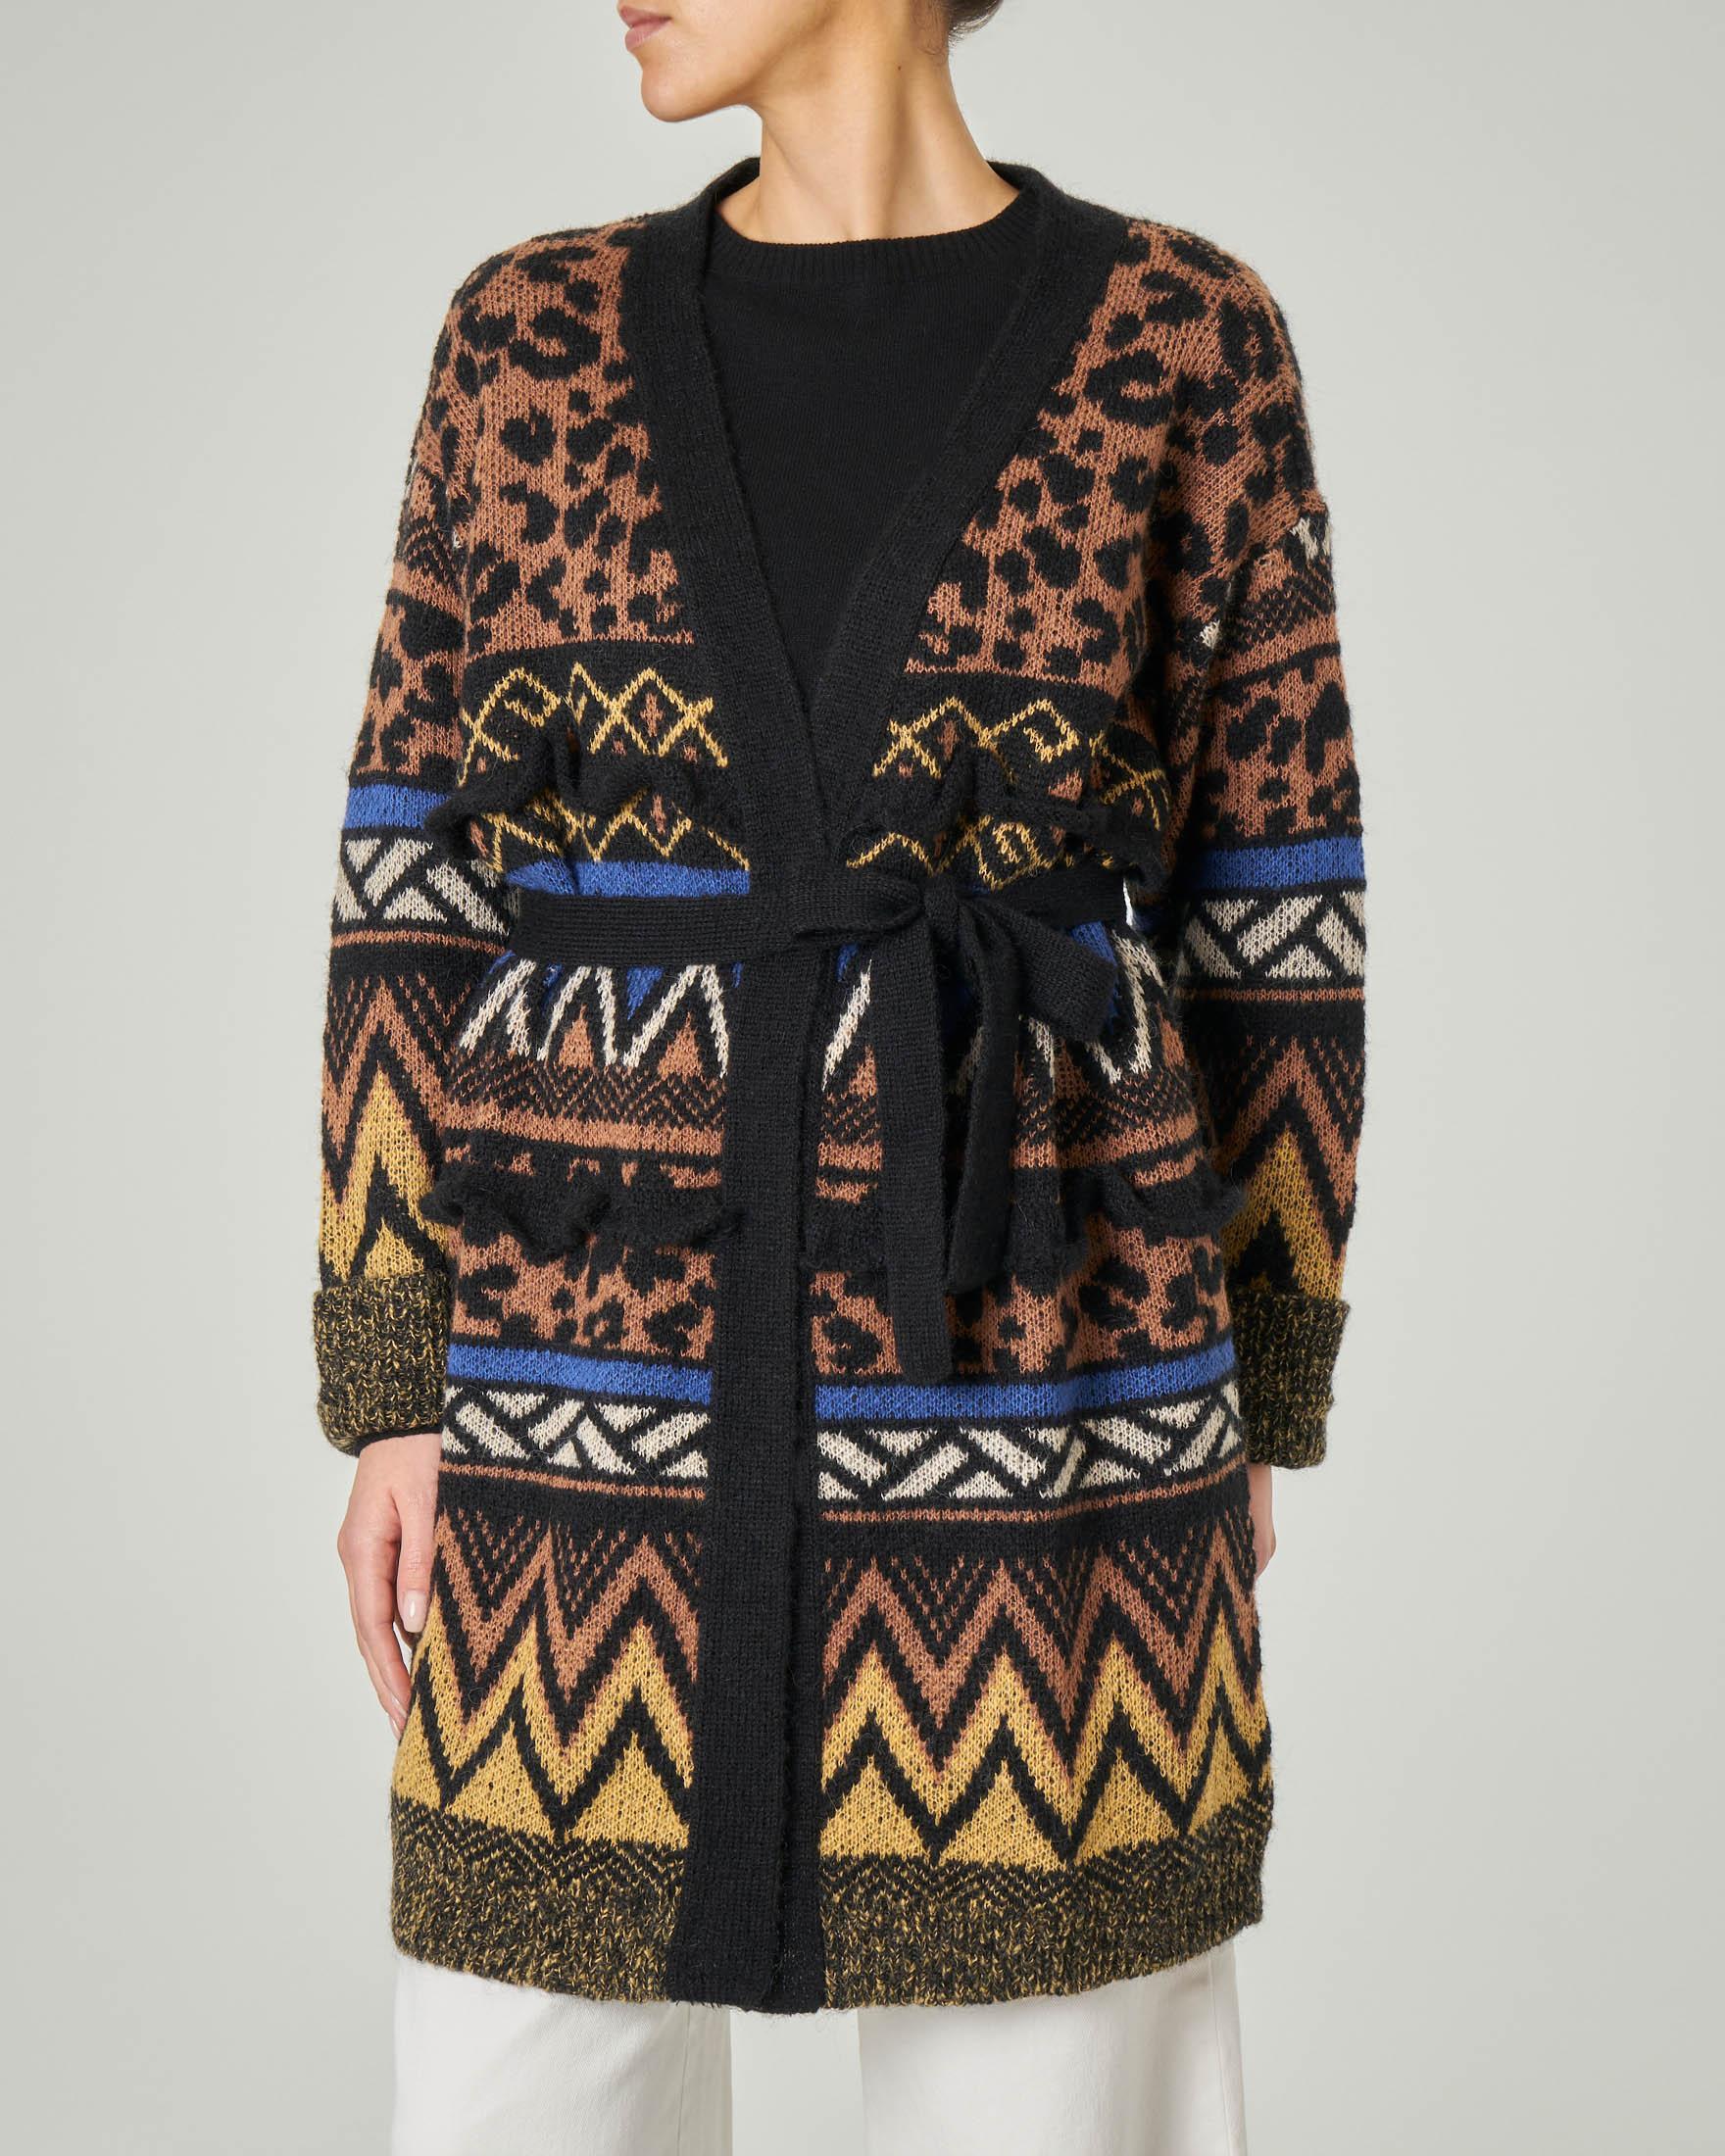 Cardigan in lana e mohair con motivi jacquard multicolor e rouches e cintura in vita